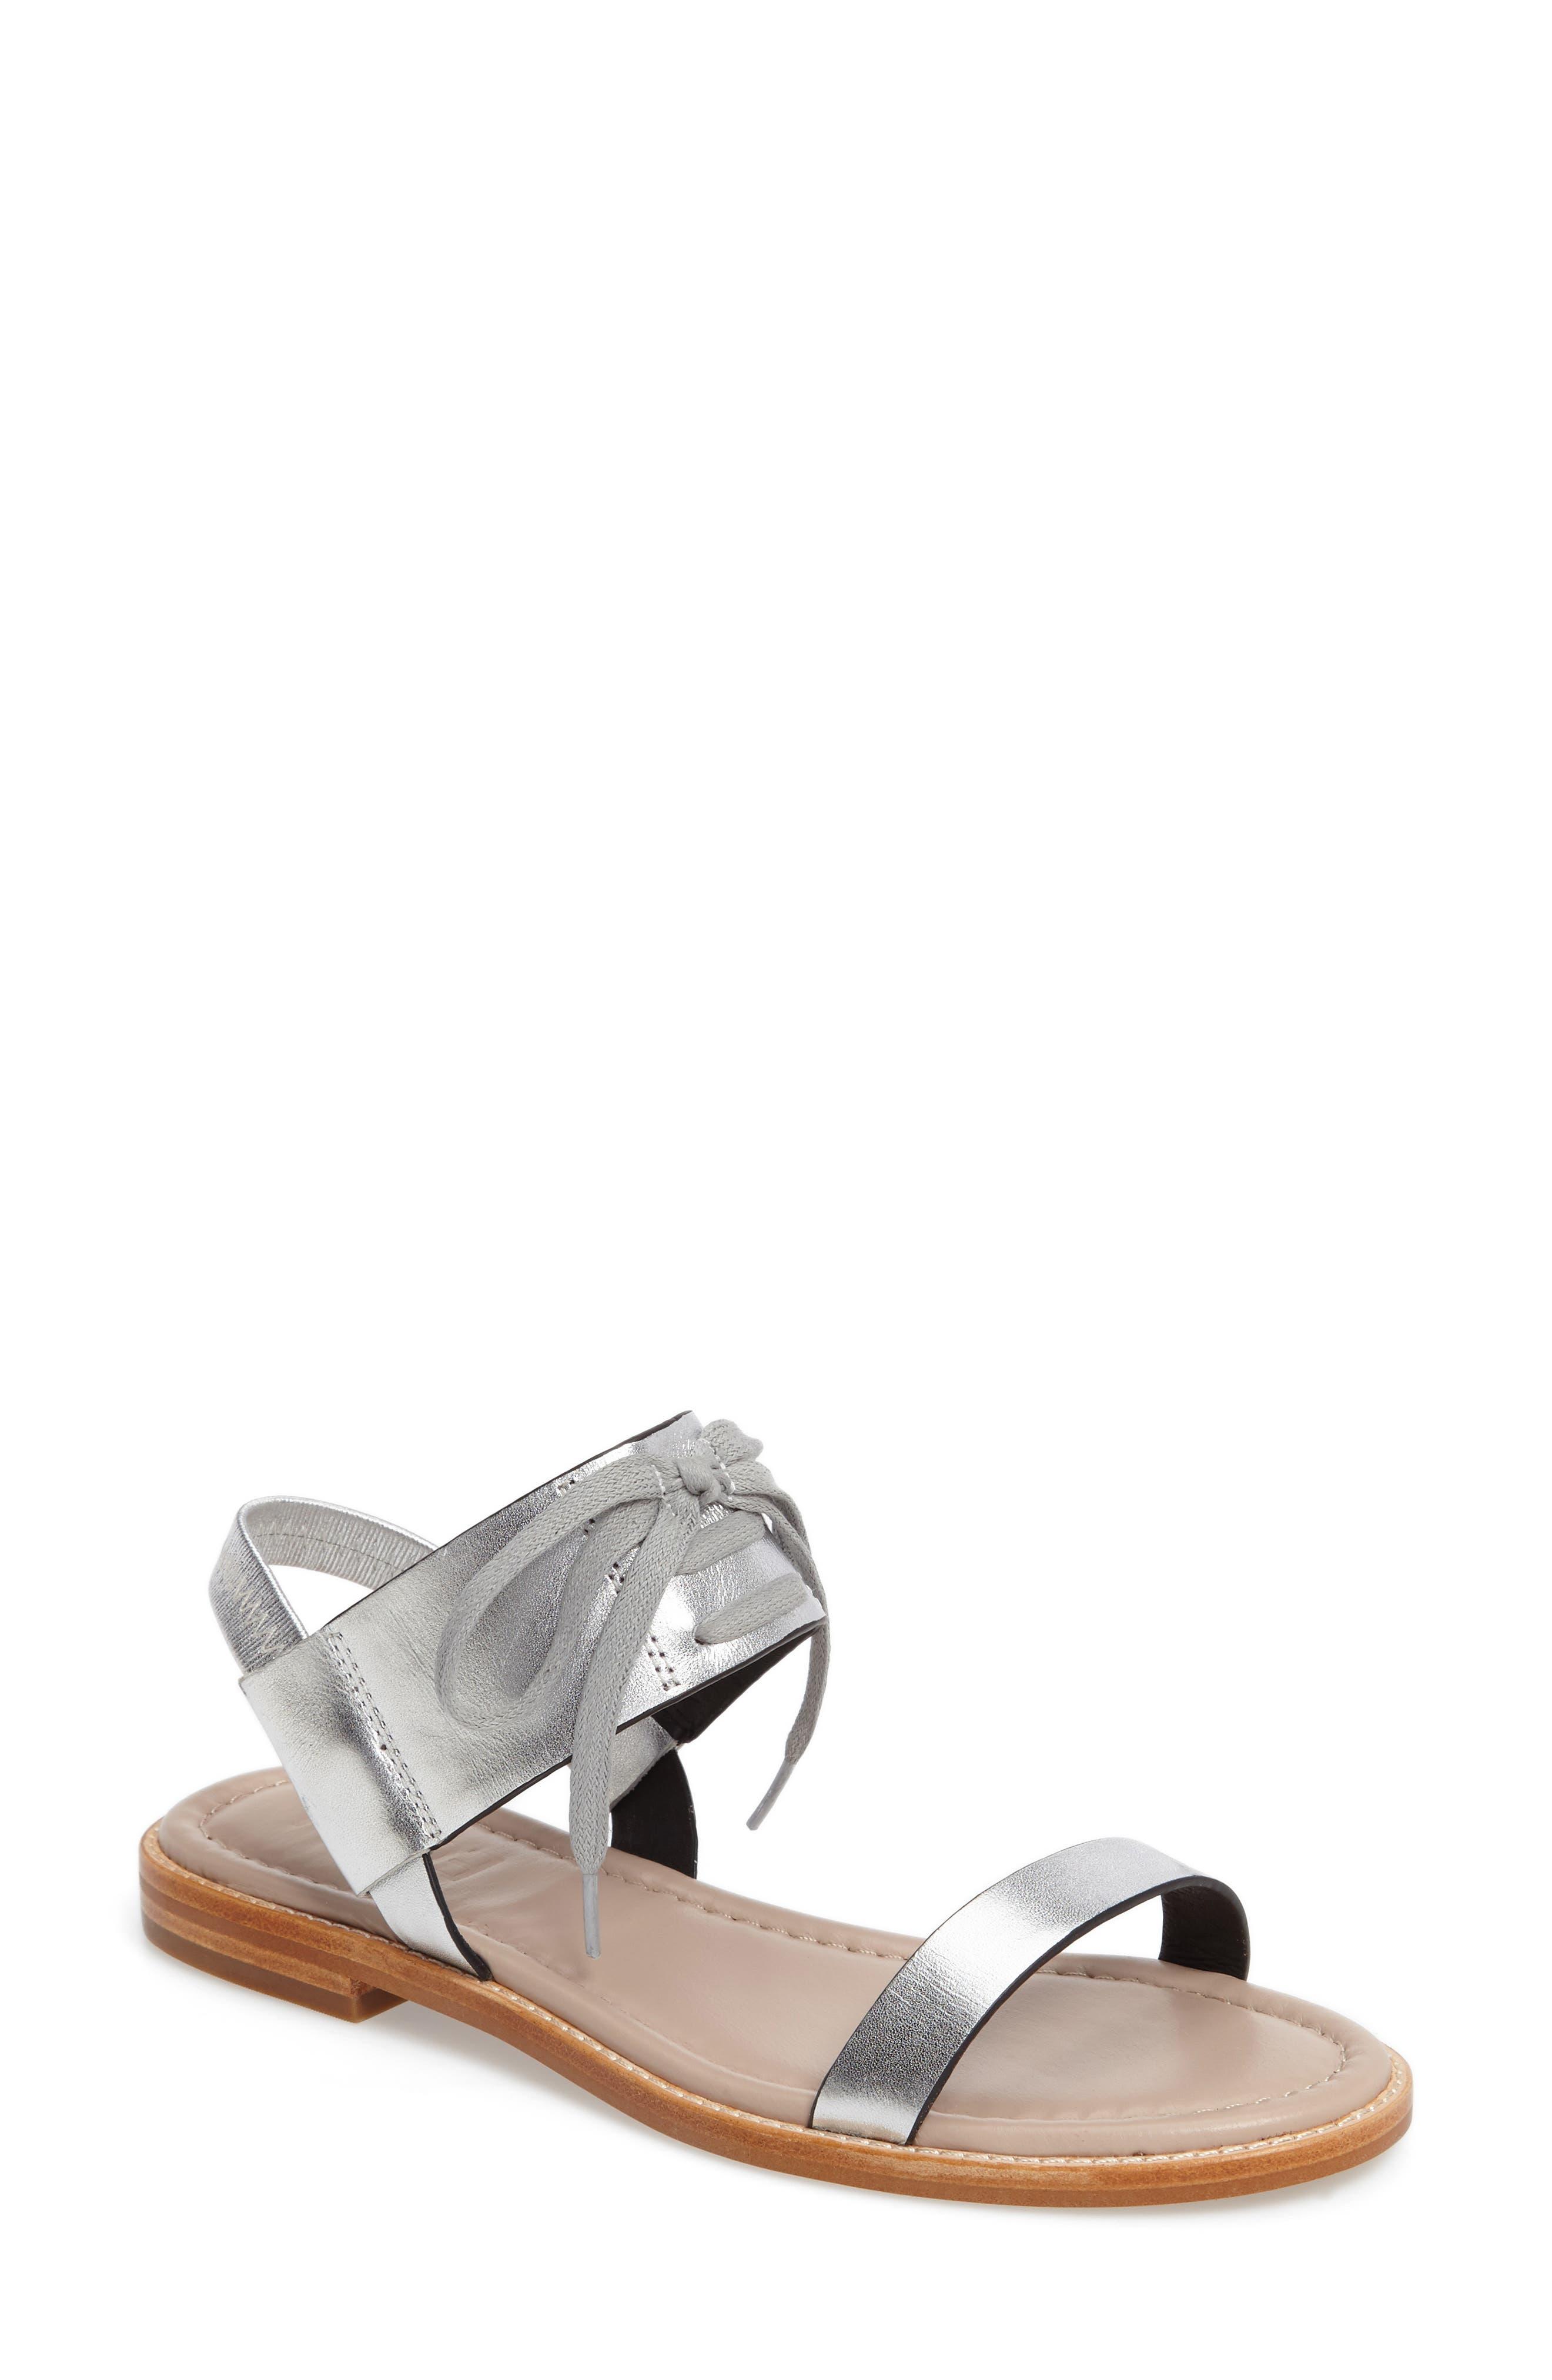 M4D3 Hailey Slingback Sandal,                         Main,                         color, Silver Leather